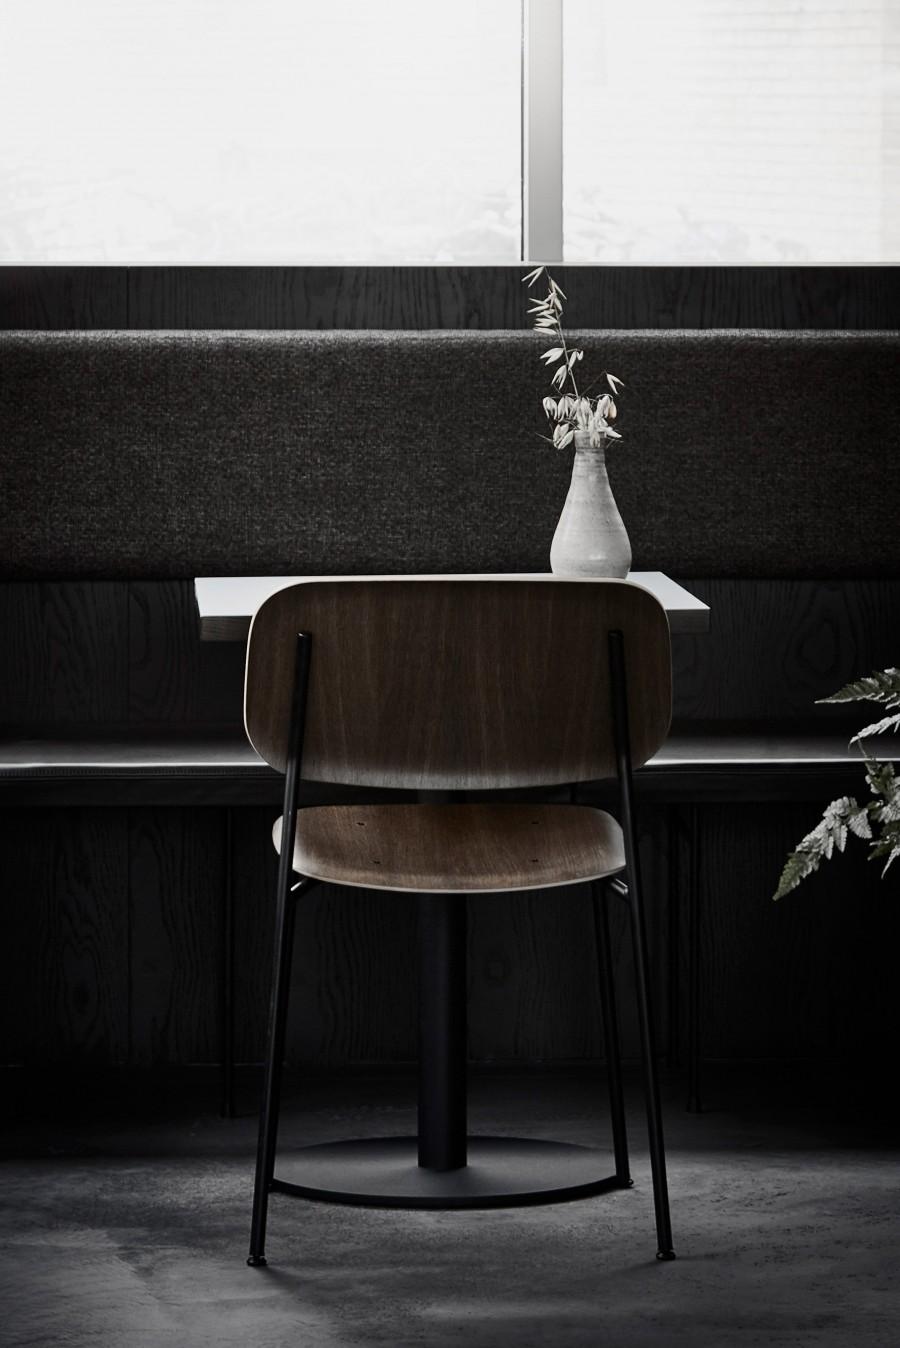 norm-architects-restaurant-aprilandmay7